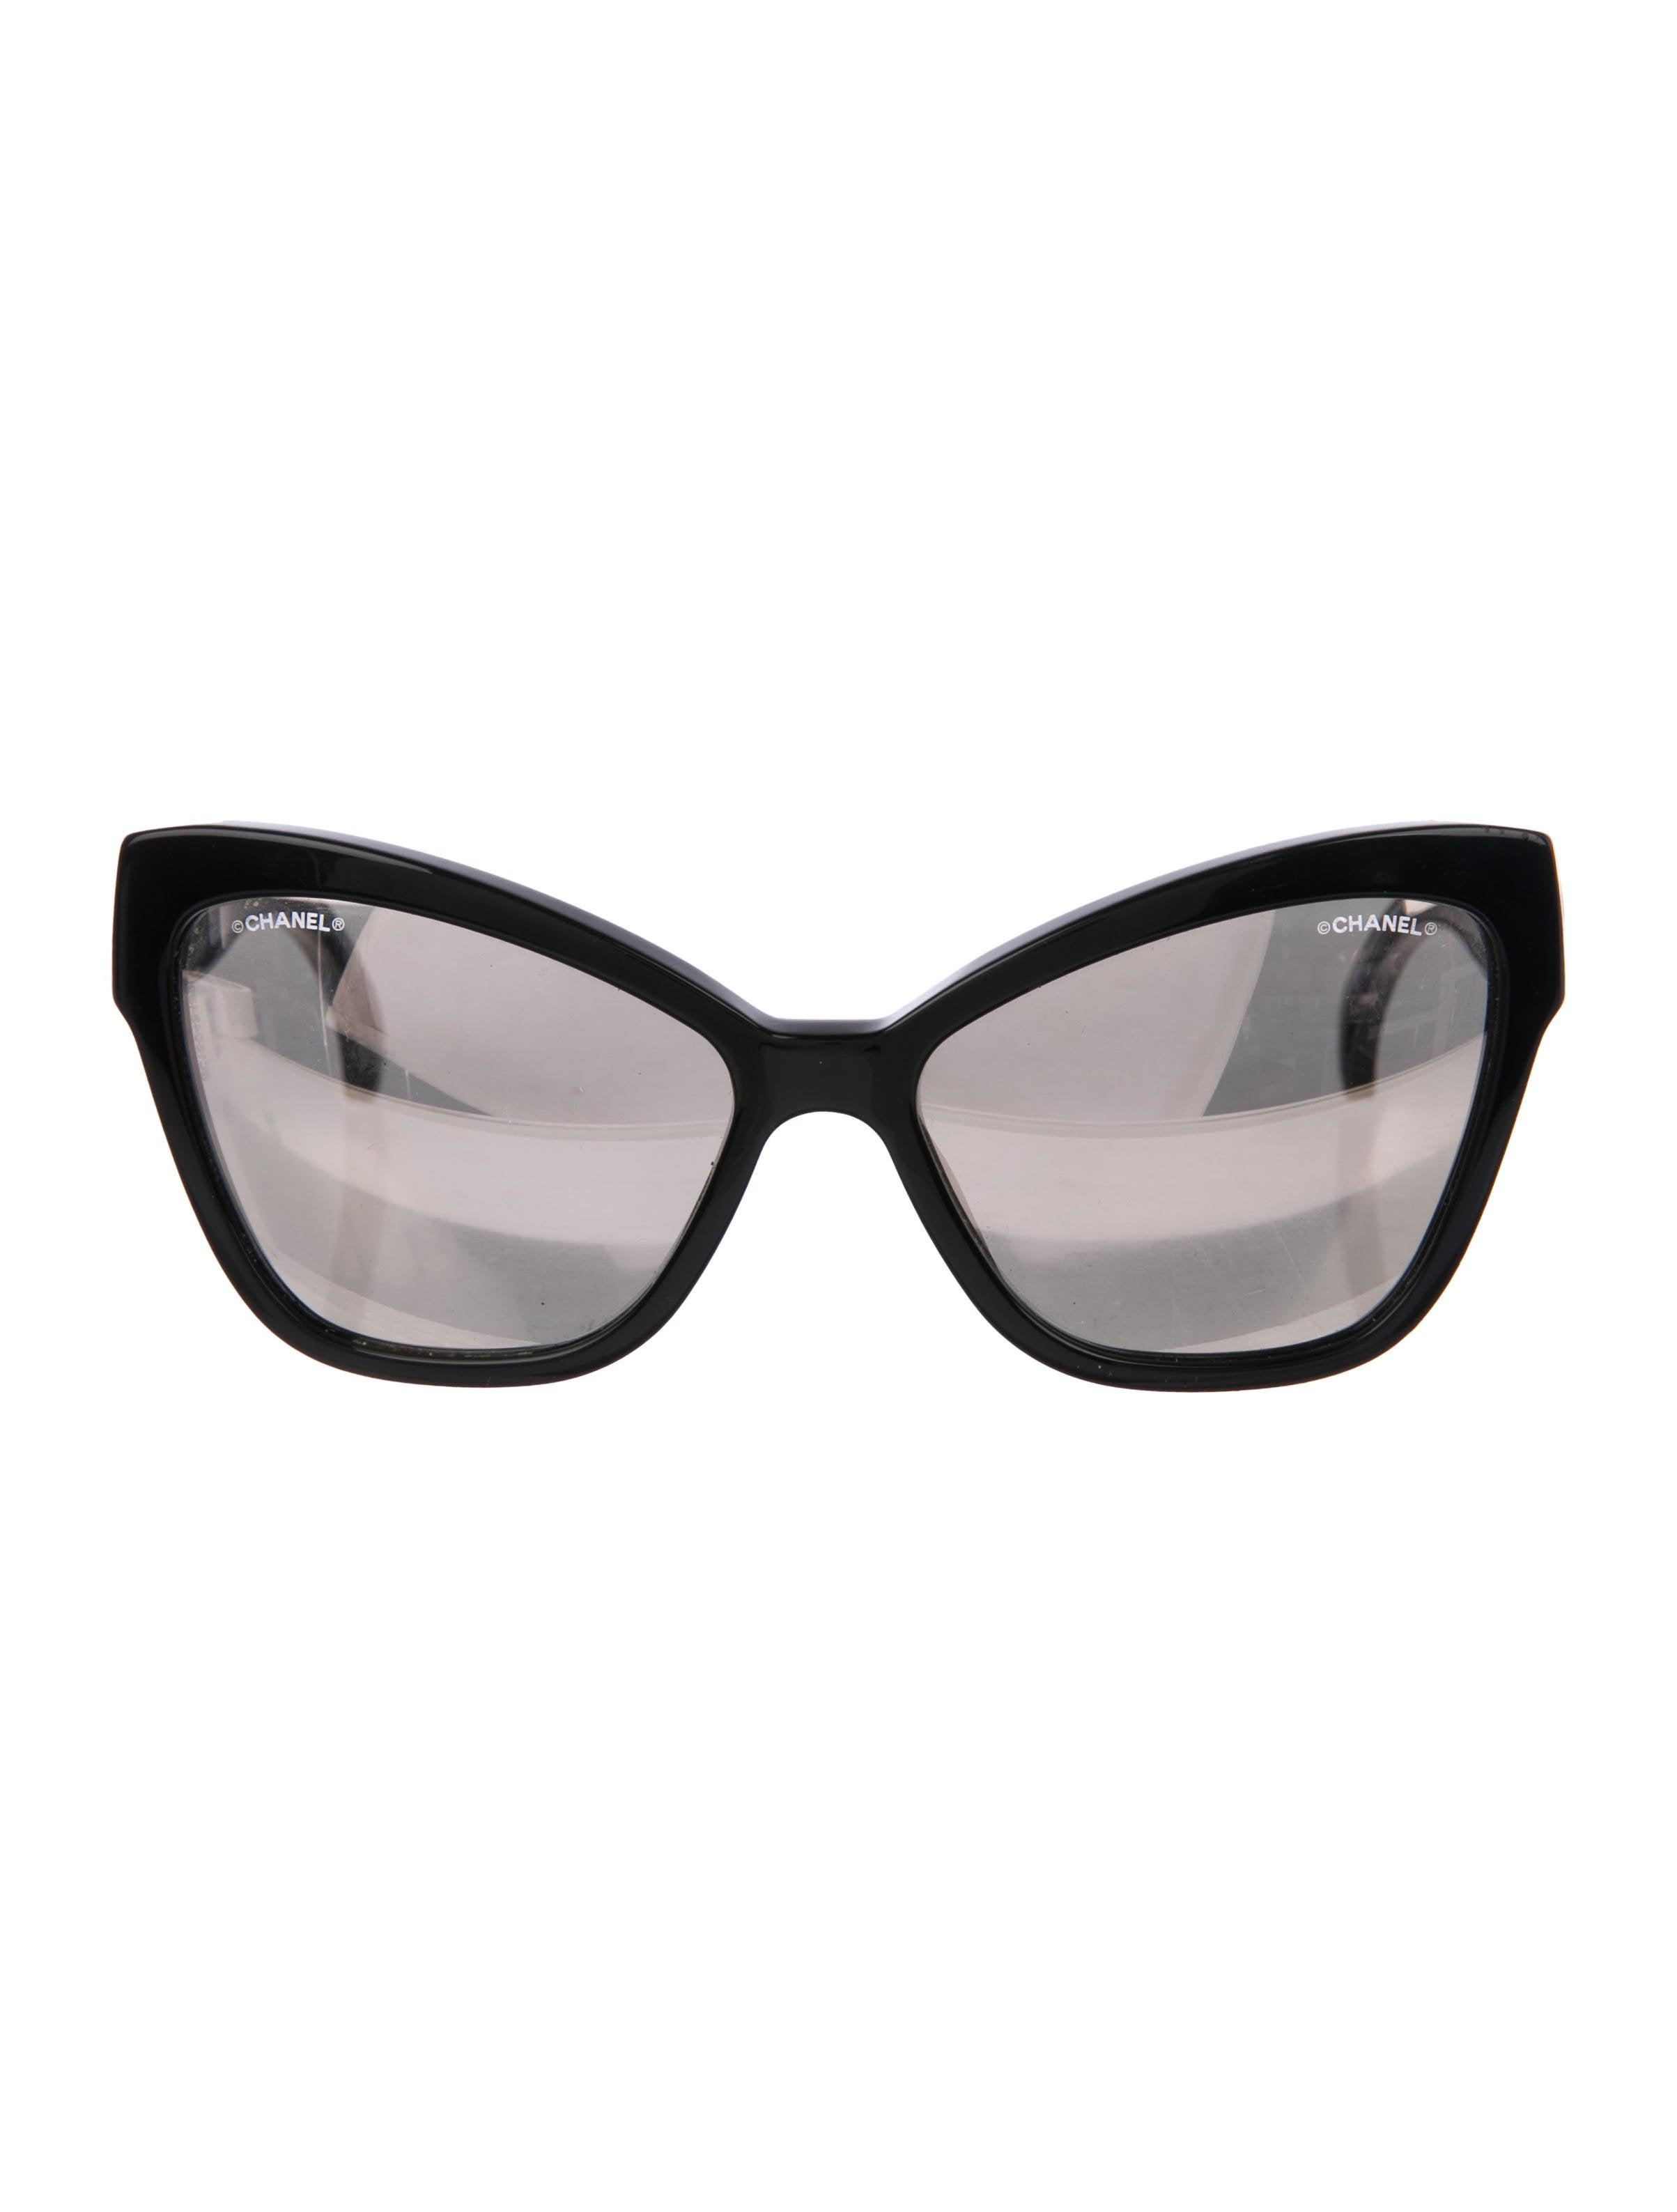 943eddee7 Chanel CC Cat-Eye Sunglasses - Accessories - CHA262063 | The RealReal